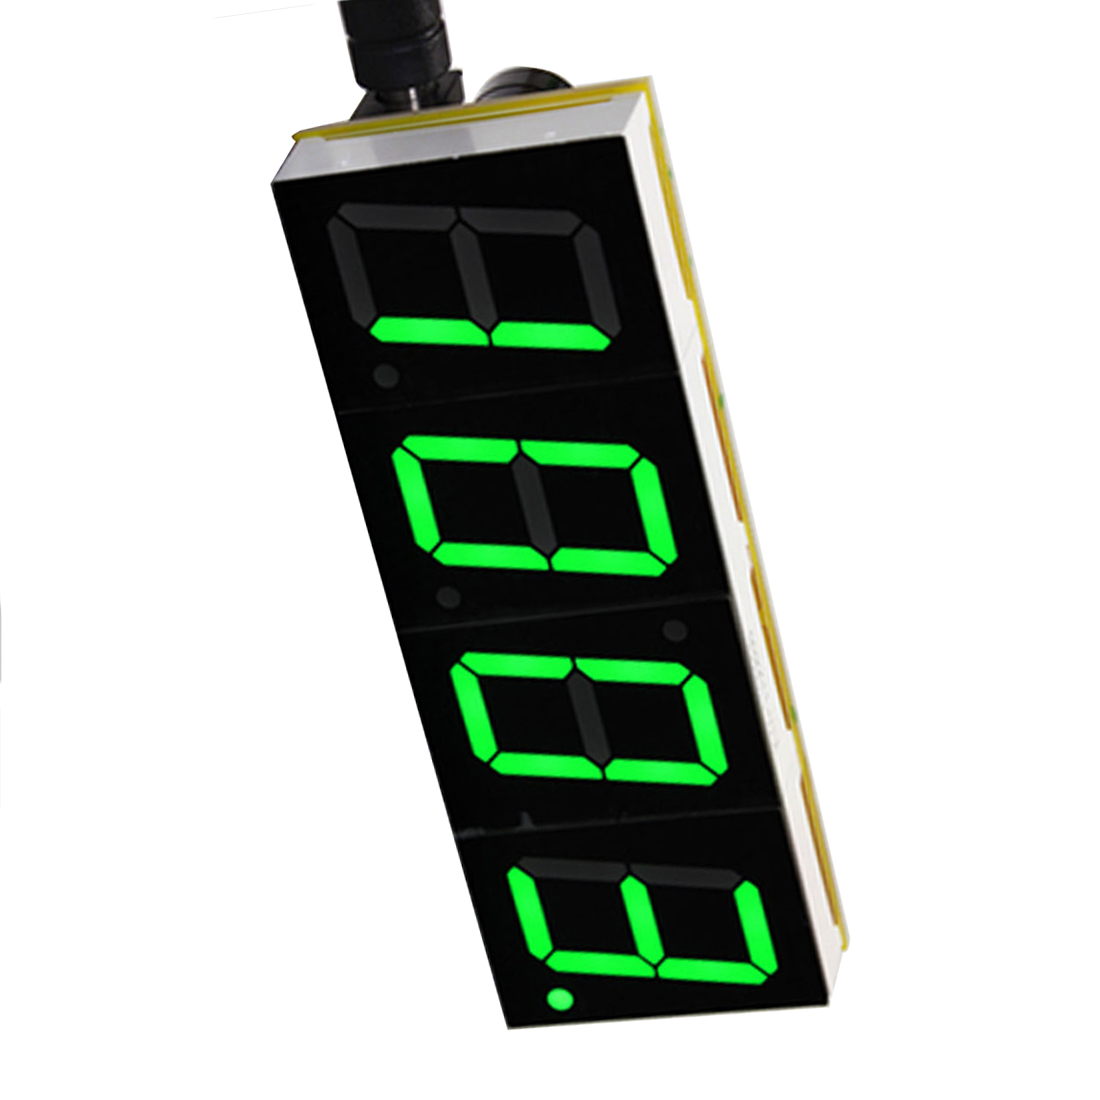 Green Digital LED Electronic Microcontroller Clock Screen Display Time DIY